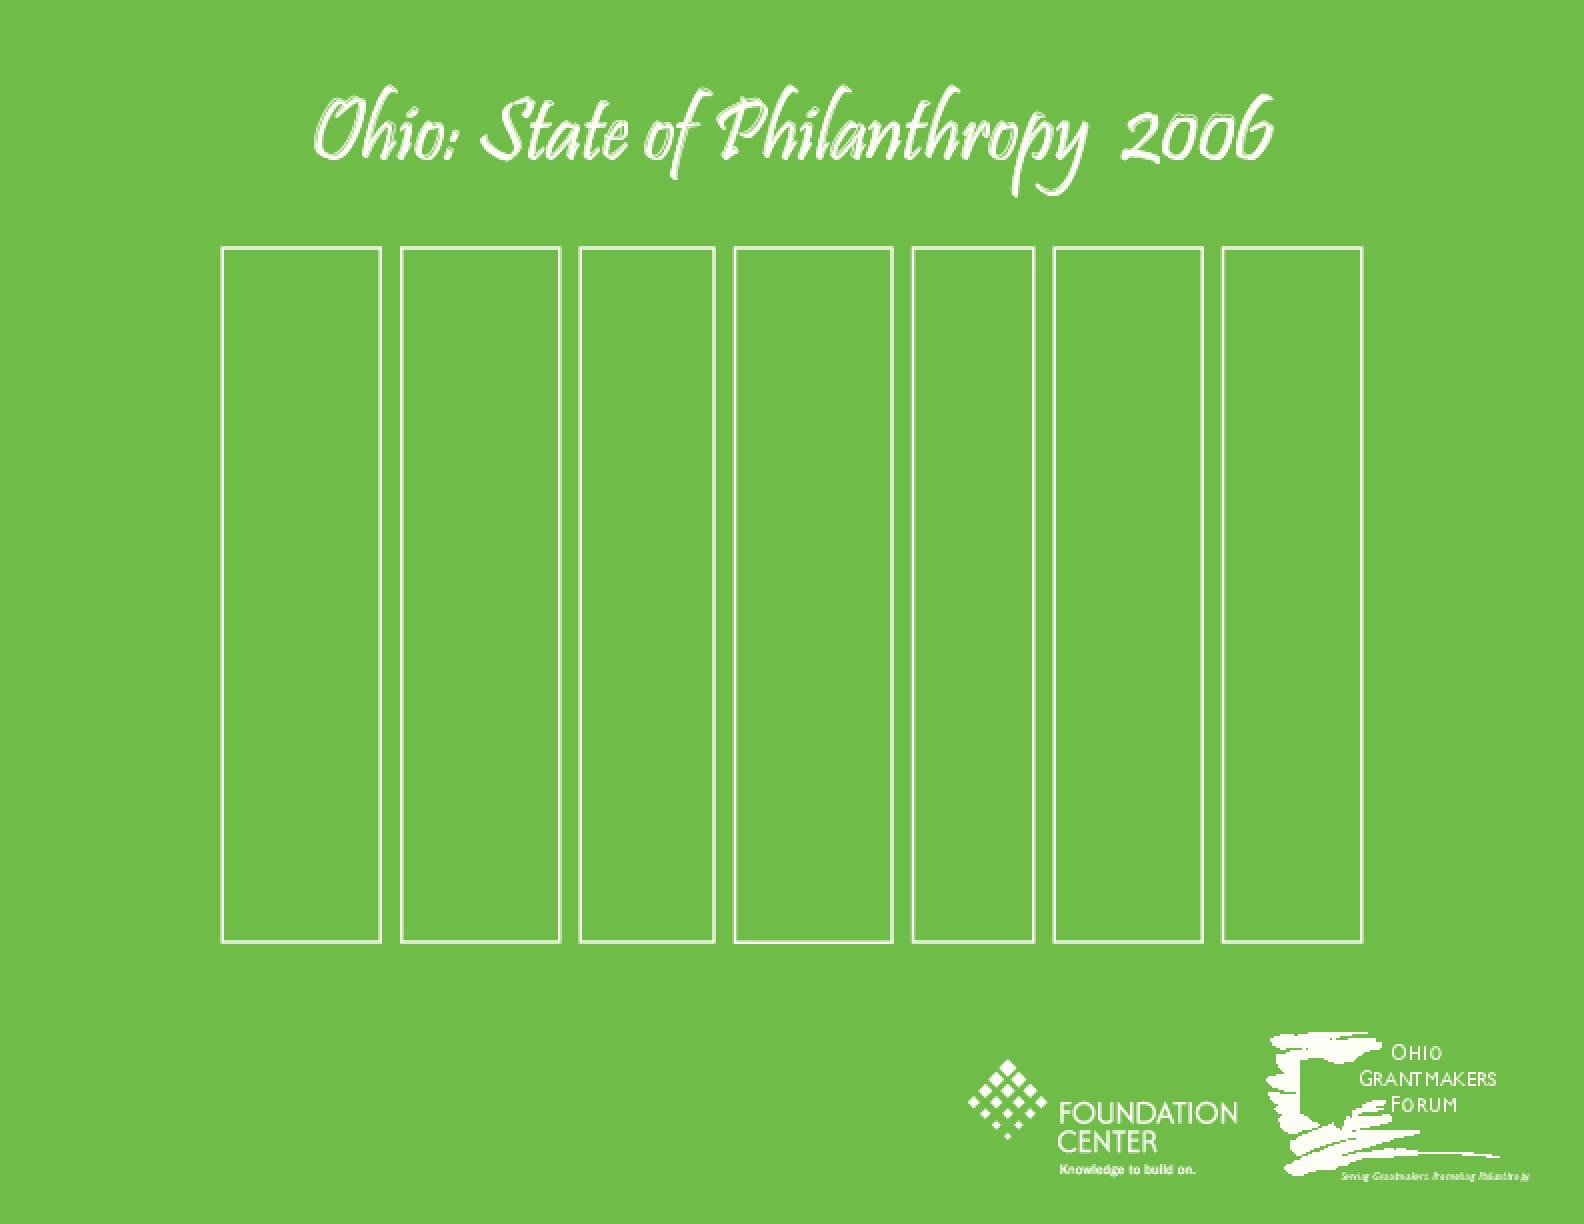 Ohio: The State of Philanthropy, 2006